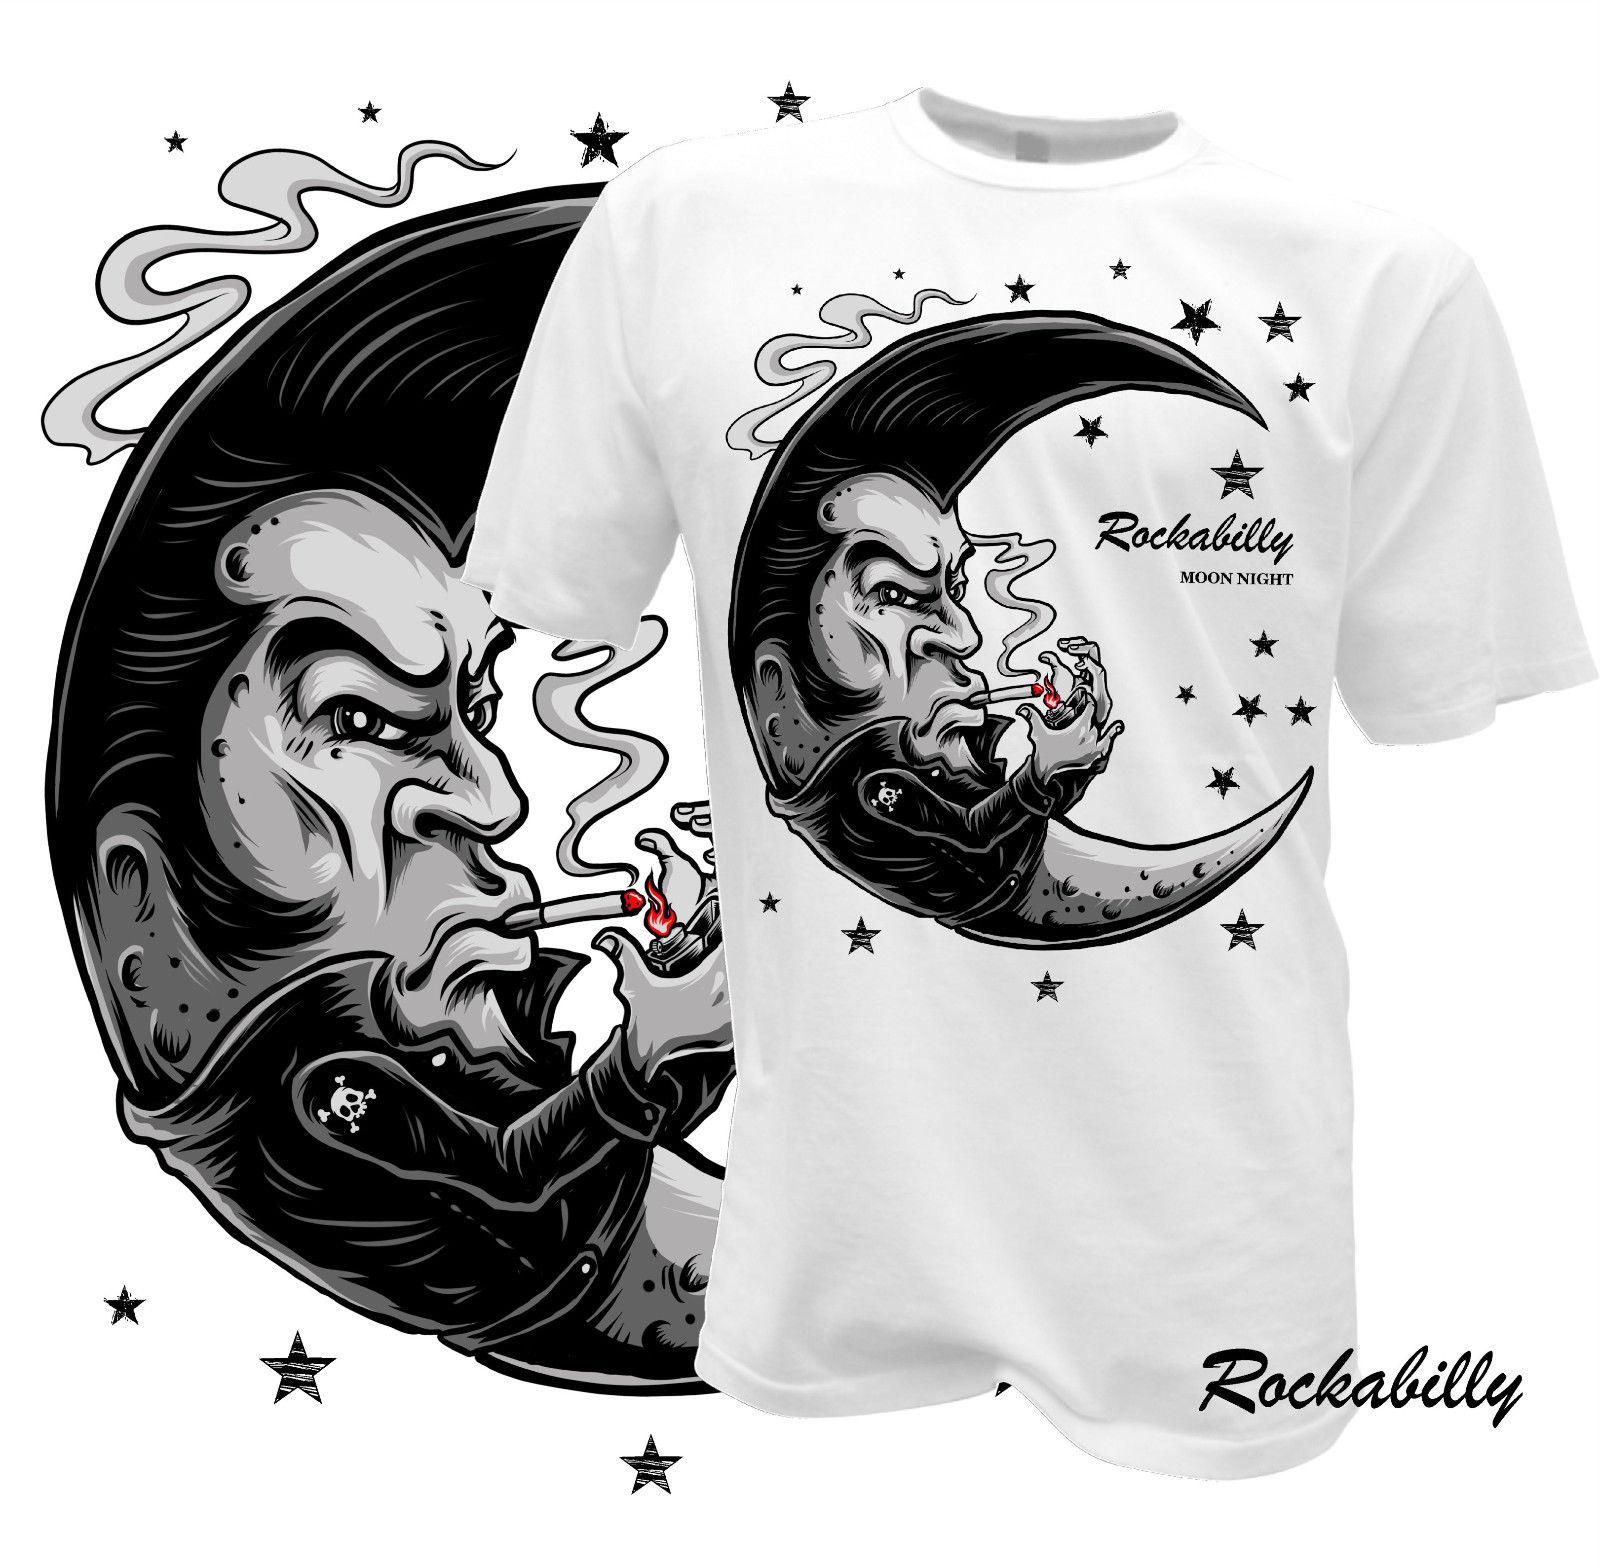 099701dd2086 Detail Feedback Questions about 100% Cotton for Man Shirts T Shirt  Rockabilly Mond Nacht